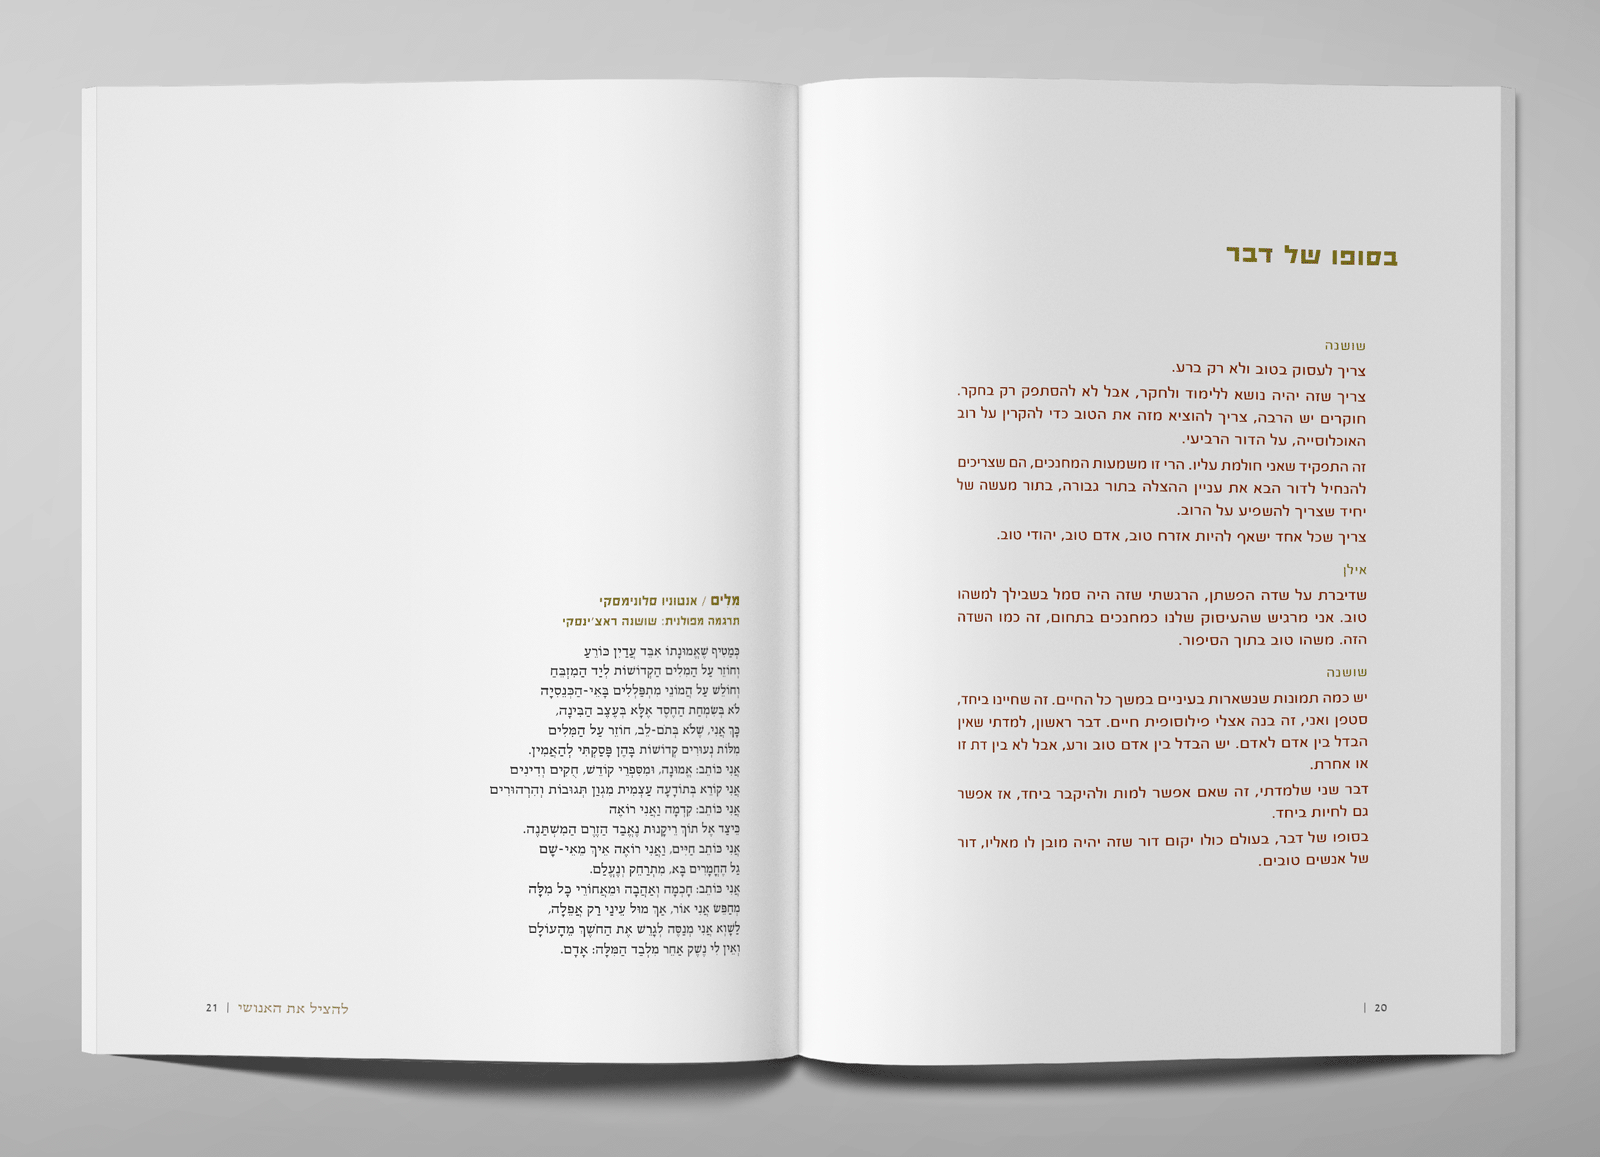 http://bigeyes.co.il/wp-content/uploads/2019/08/hasidim-6.png